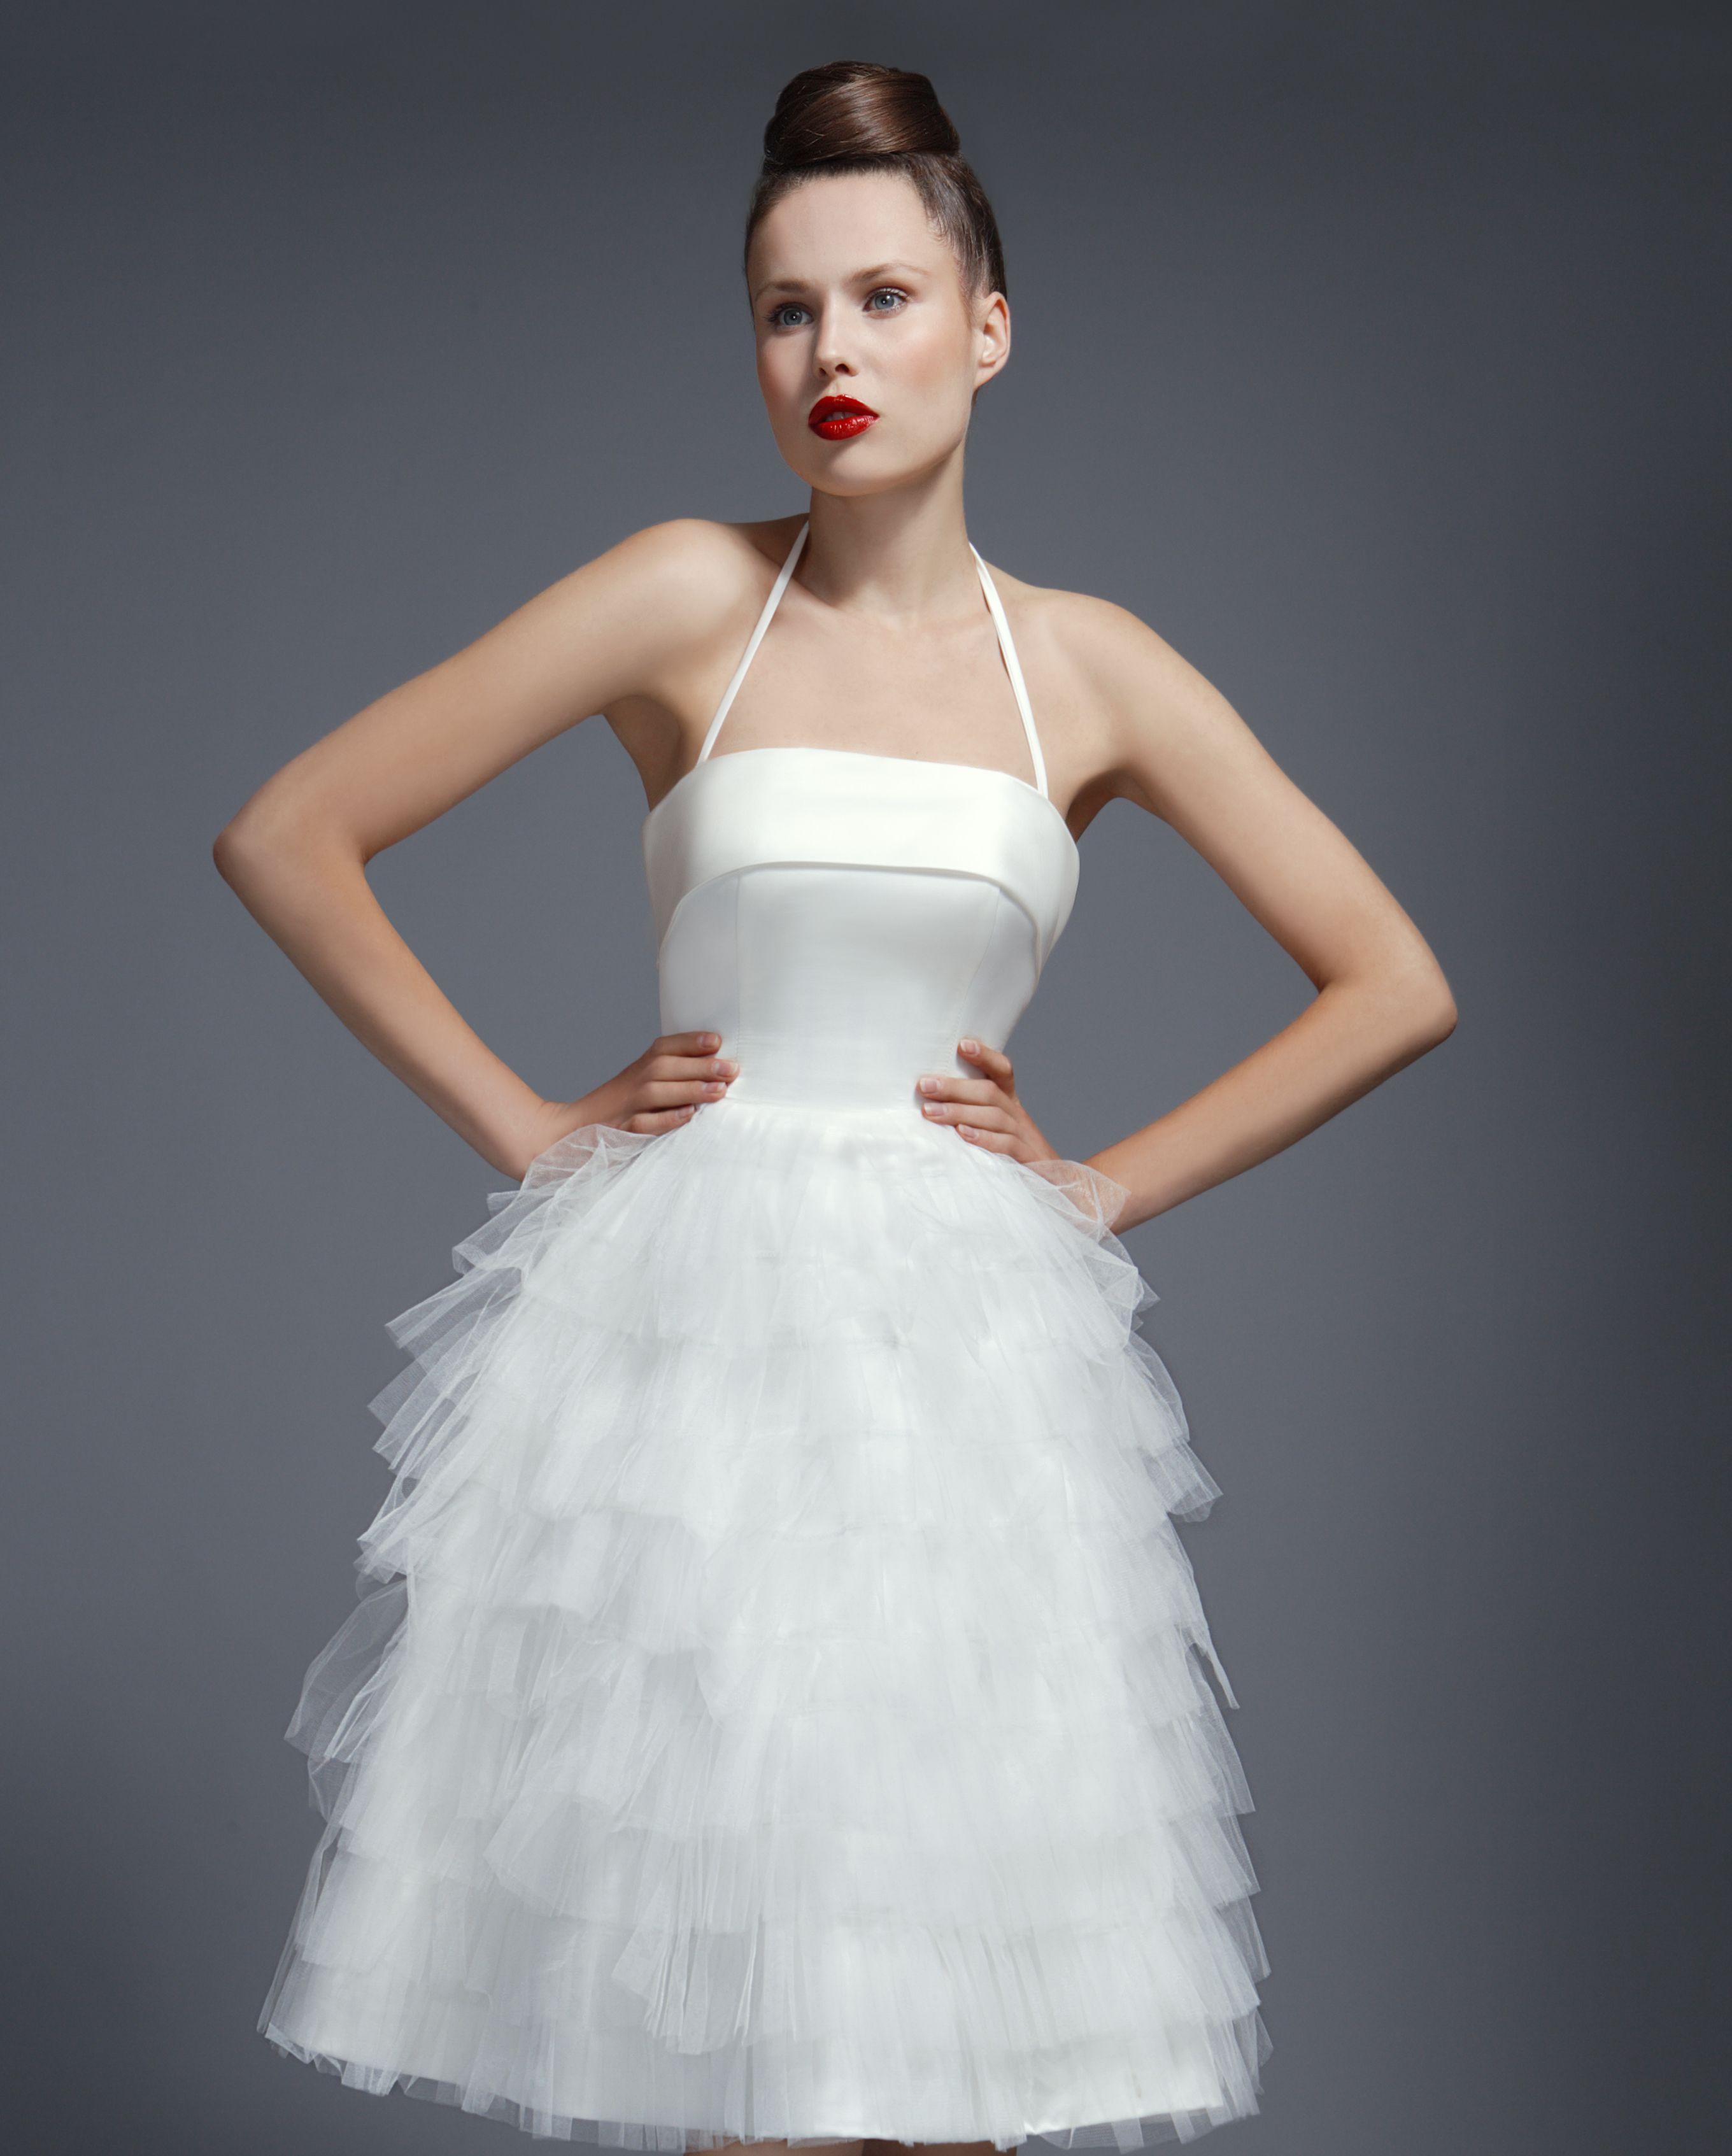 Tea Length Wedding Dresses,Short Wedding Dresses,1950s wedding dresses, Tobi Hannah, Tutu Ballerine